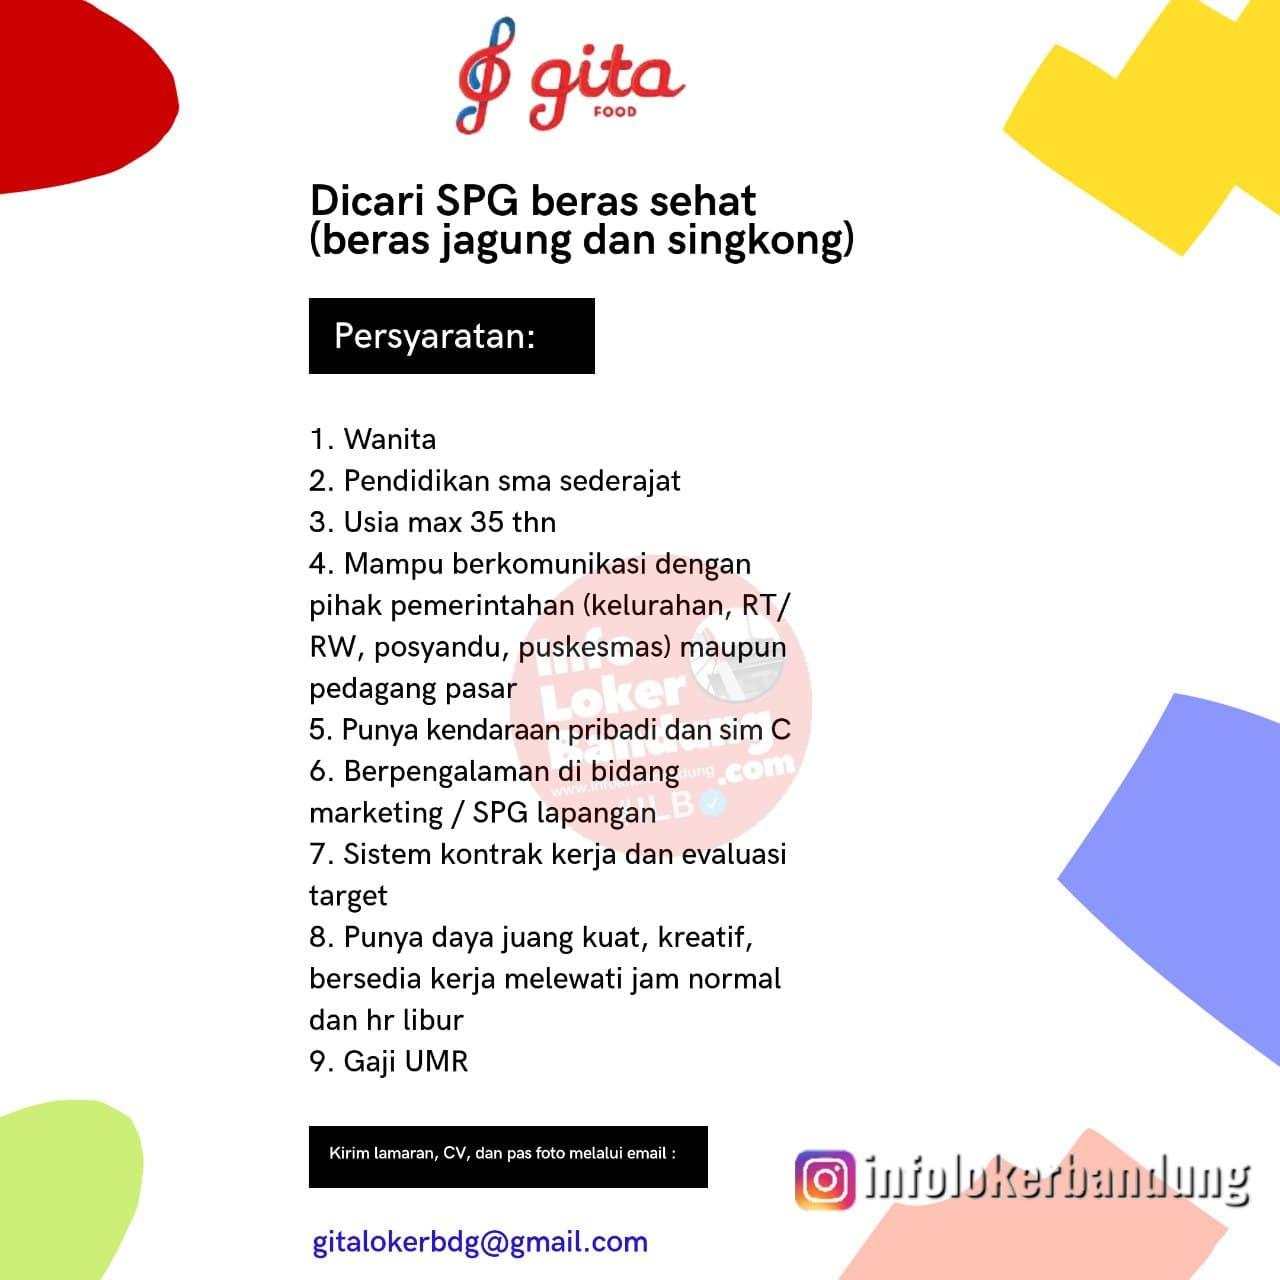 Lowongan Kerja SPG Beras Sehat PT.Gita Food Bandung Desember 2020